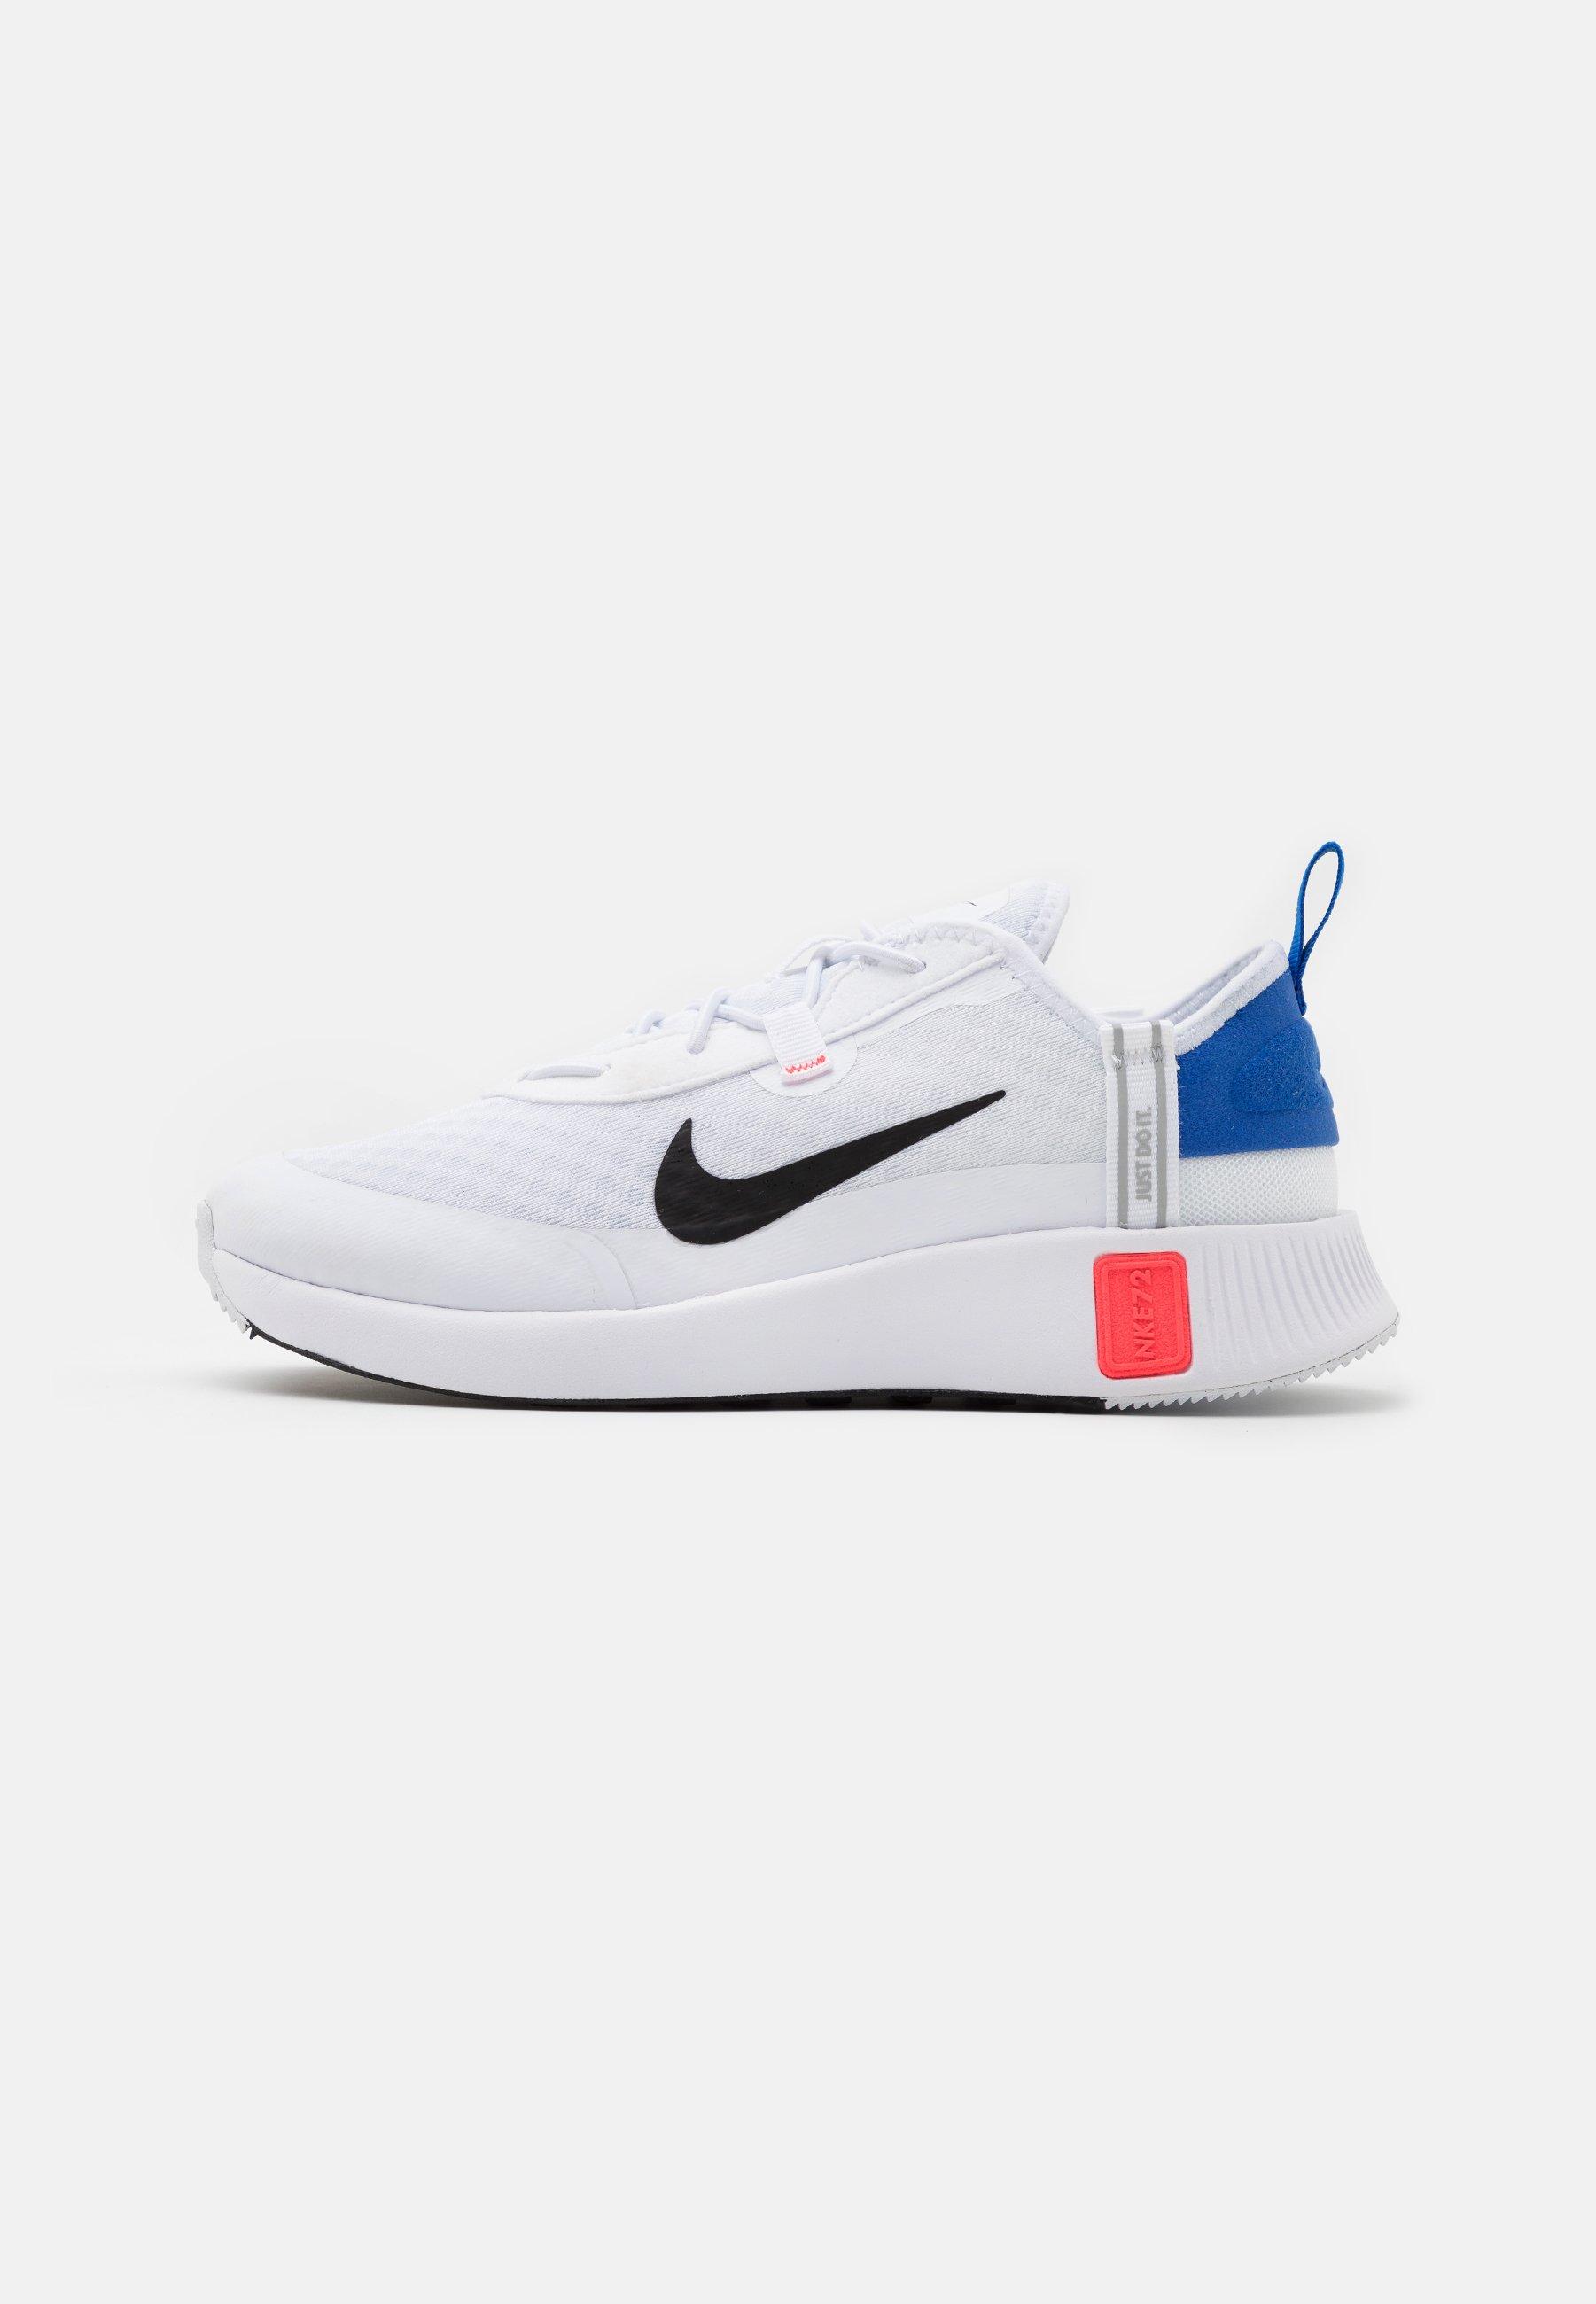 Nike Sportswear Reposto Unisex Trainers White Black Flash Crimson Game Royal White Zalando Co Uk